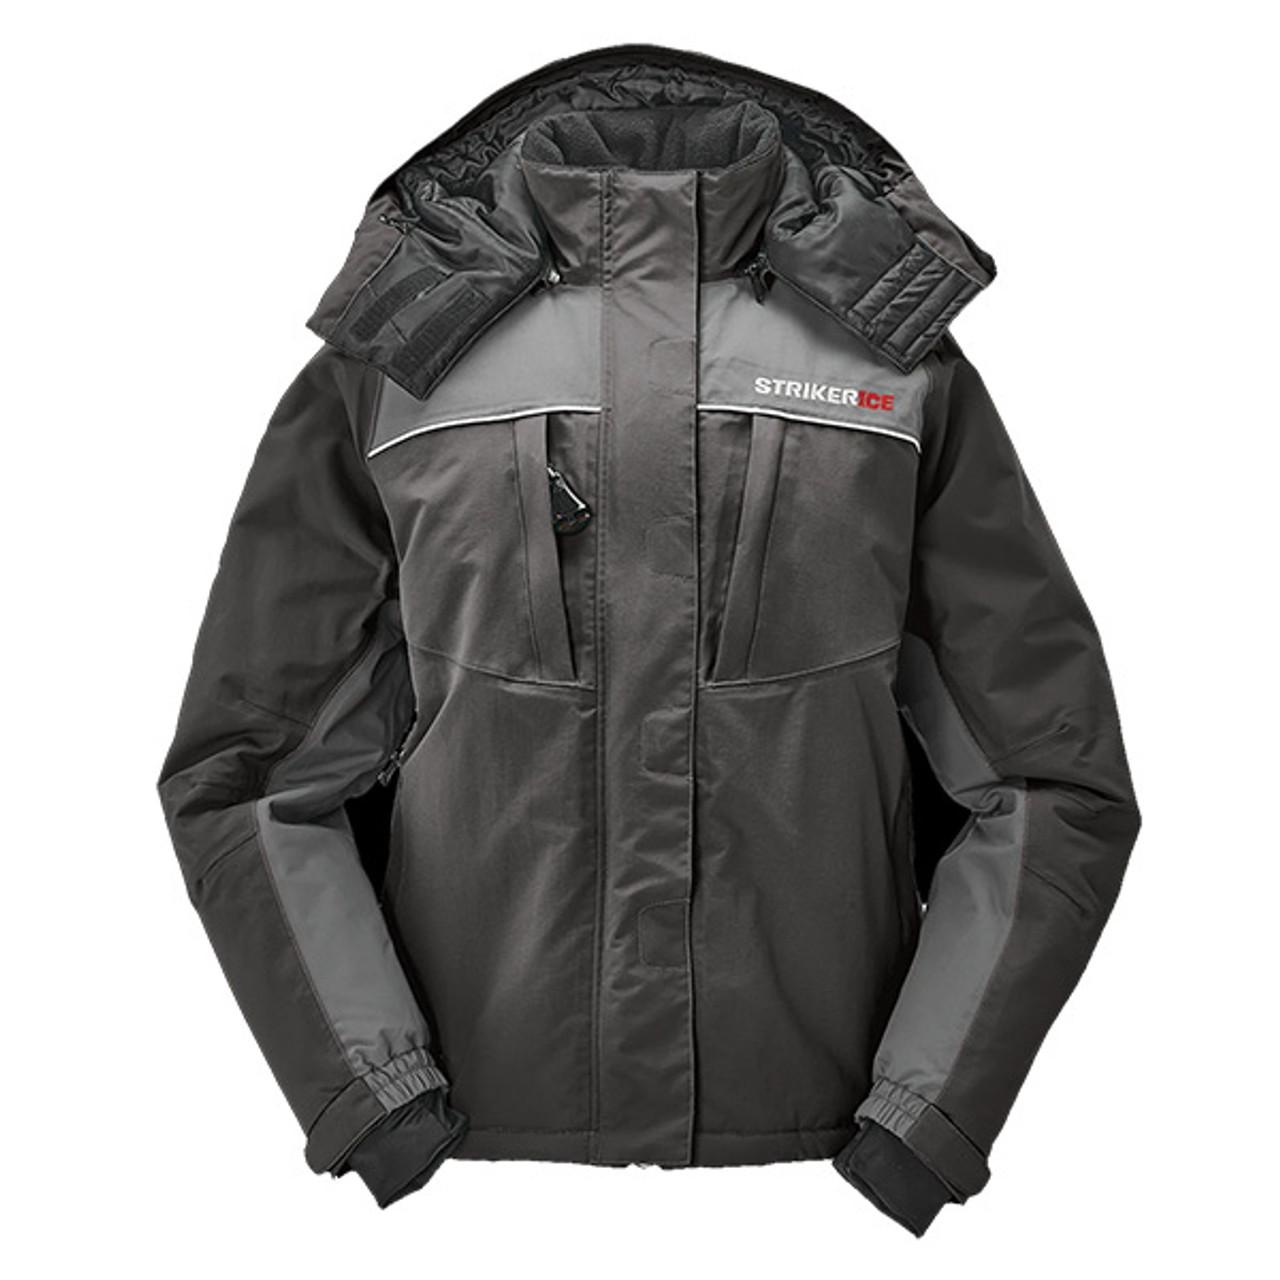 New 2020 Black/Gray Striker Ice Women's Floating Prism Jacket